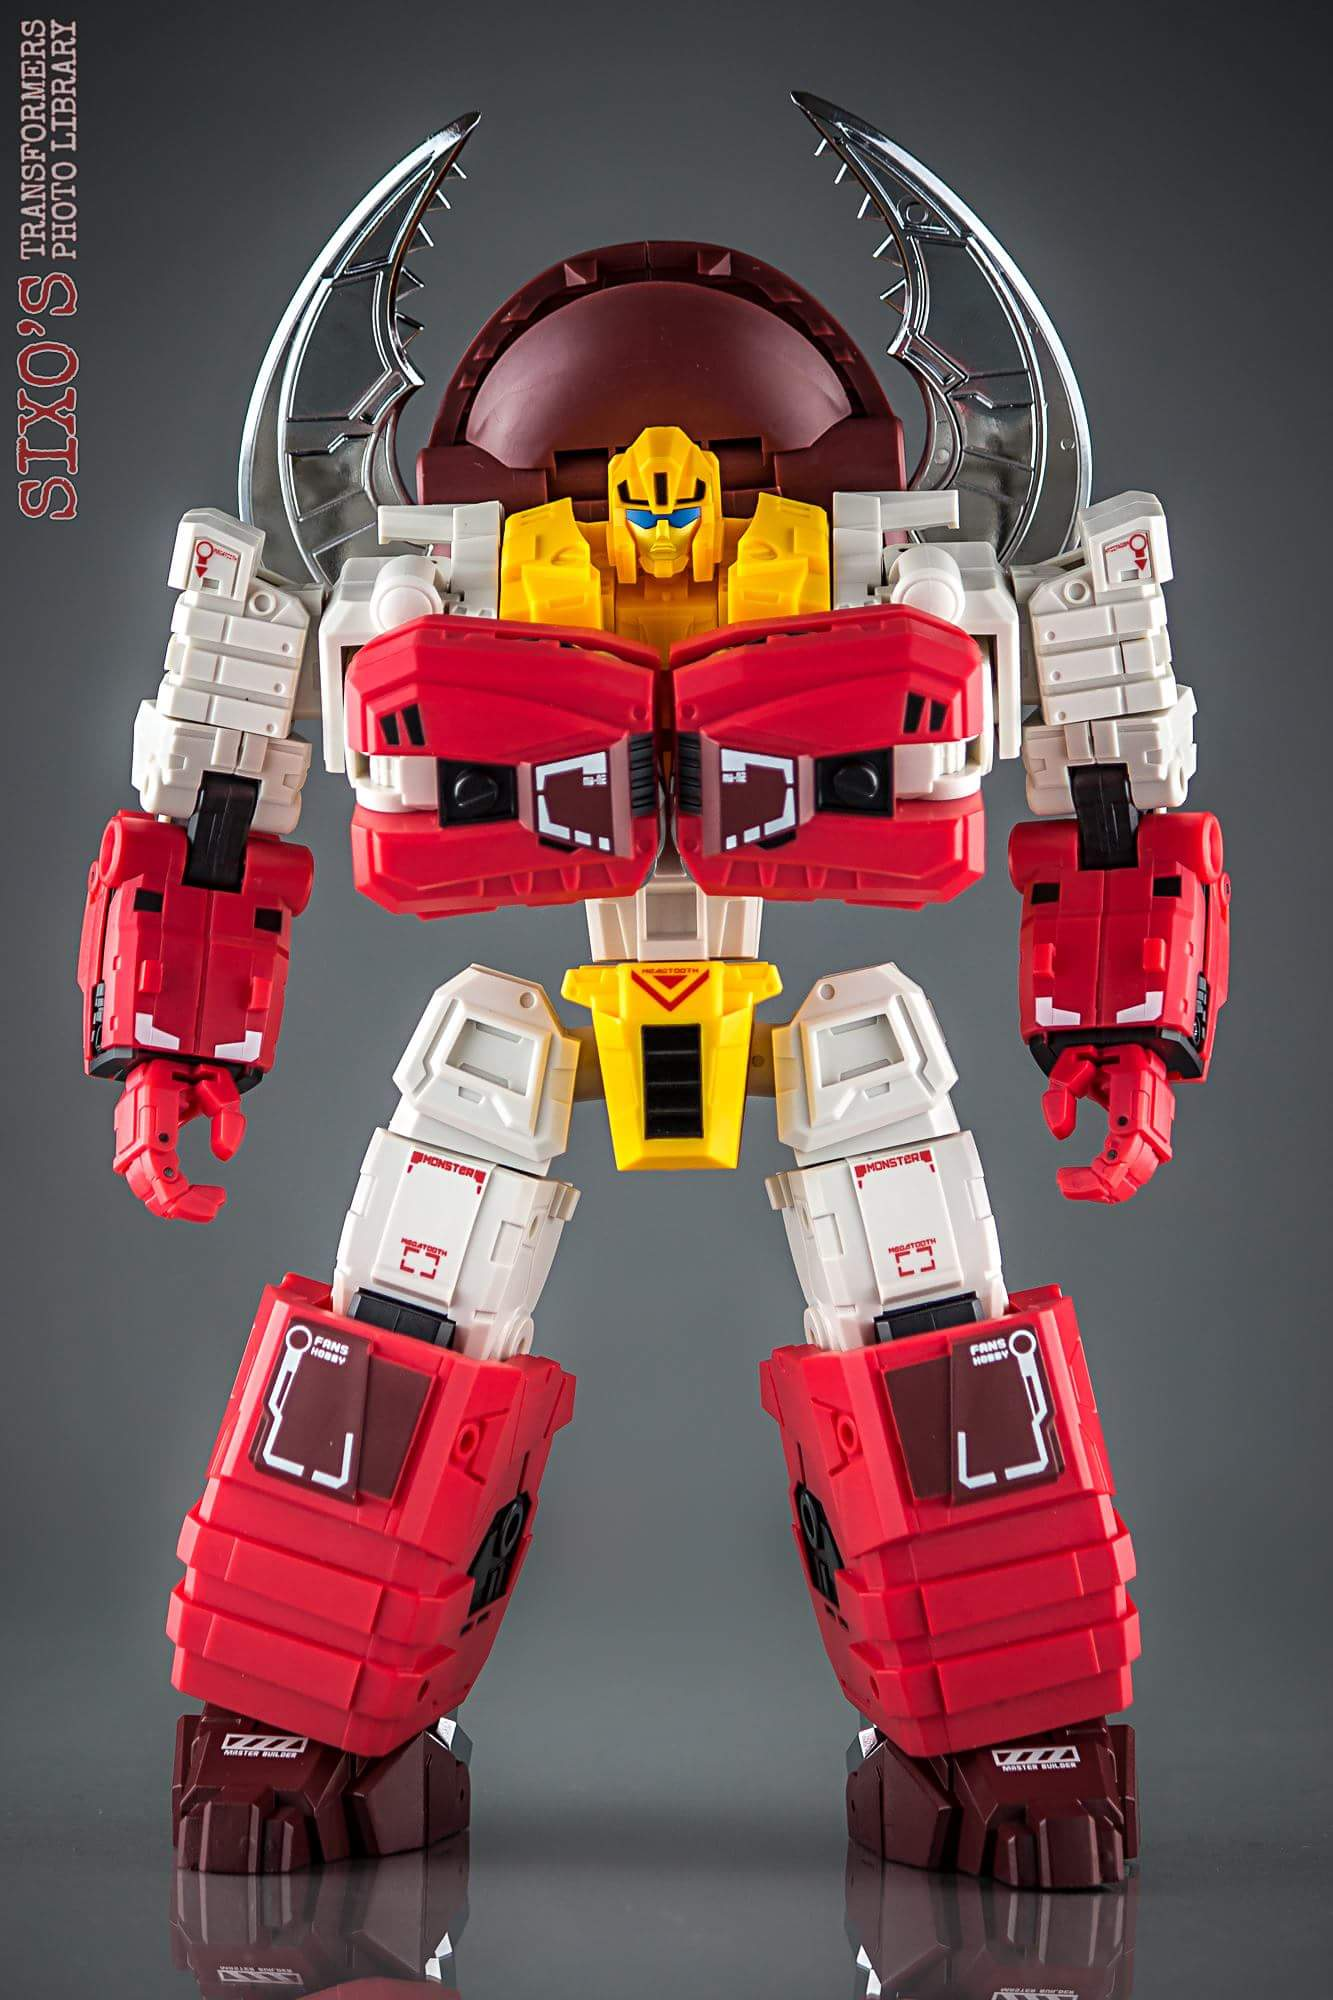 [FansHobby] Produit Tiers - Master Builder MB-02/03/05 - aka Monsterbots/Monstrebots - Page 2 6DpRCfn0